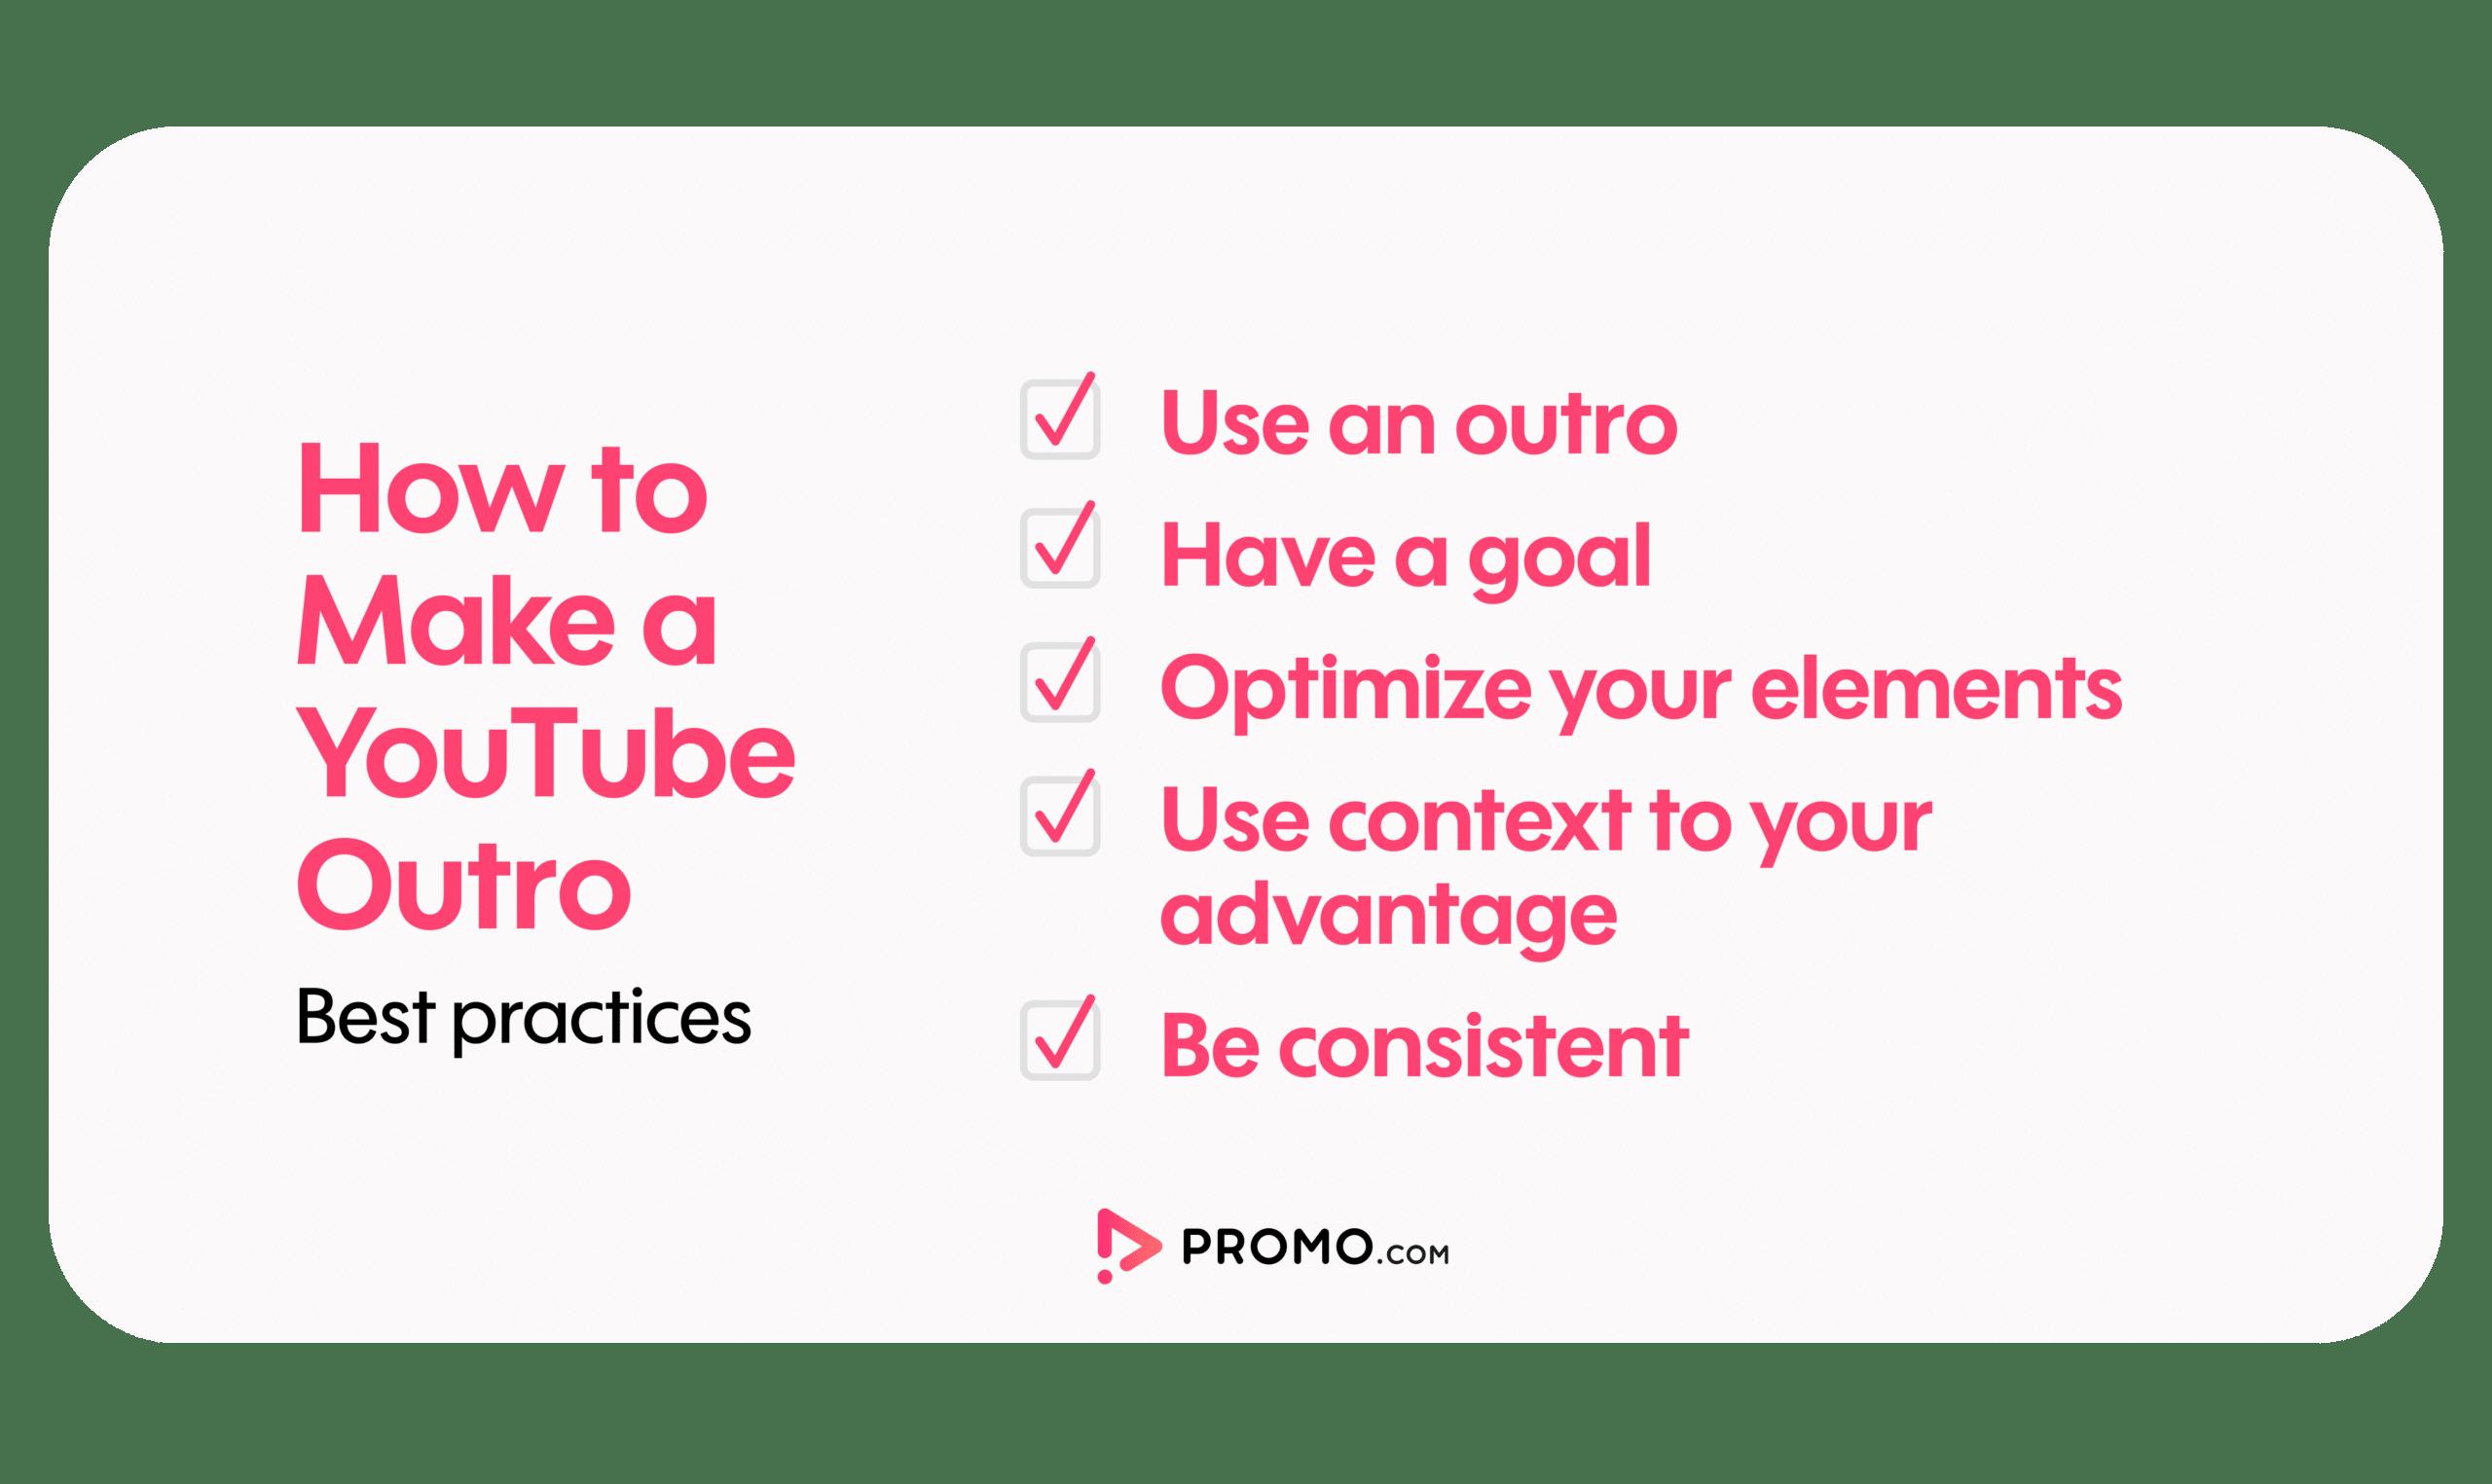 YouTube outro checklist